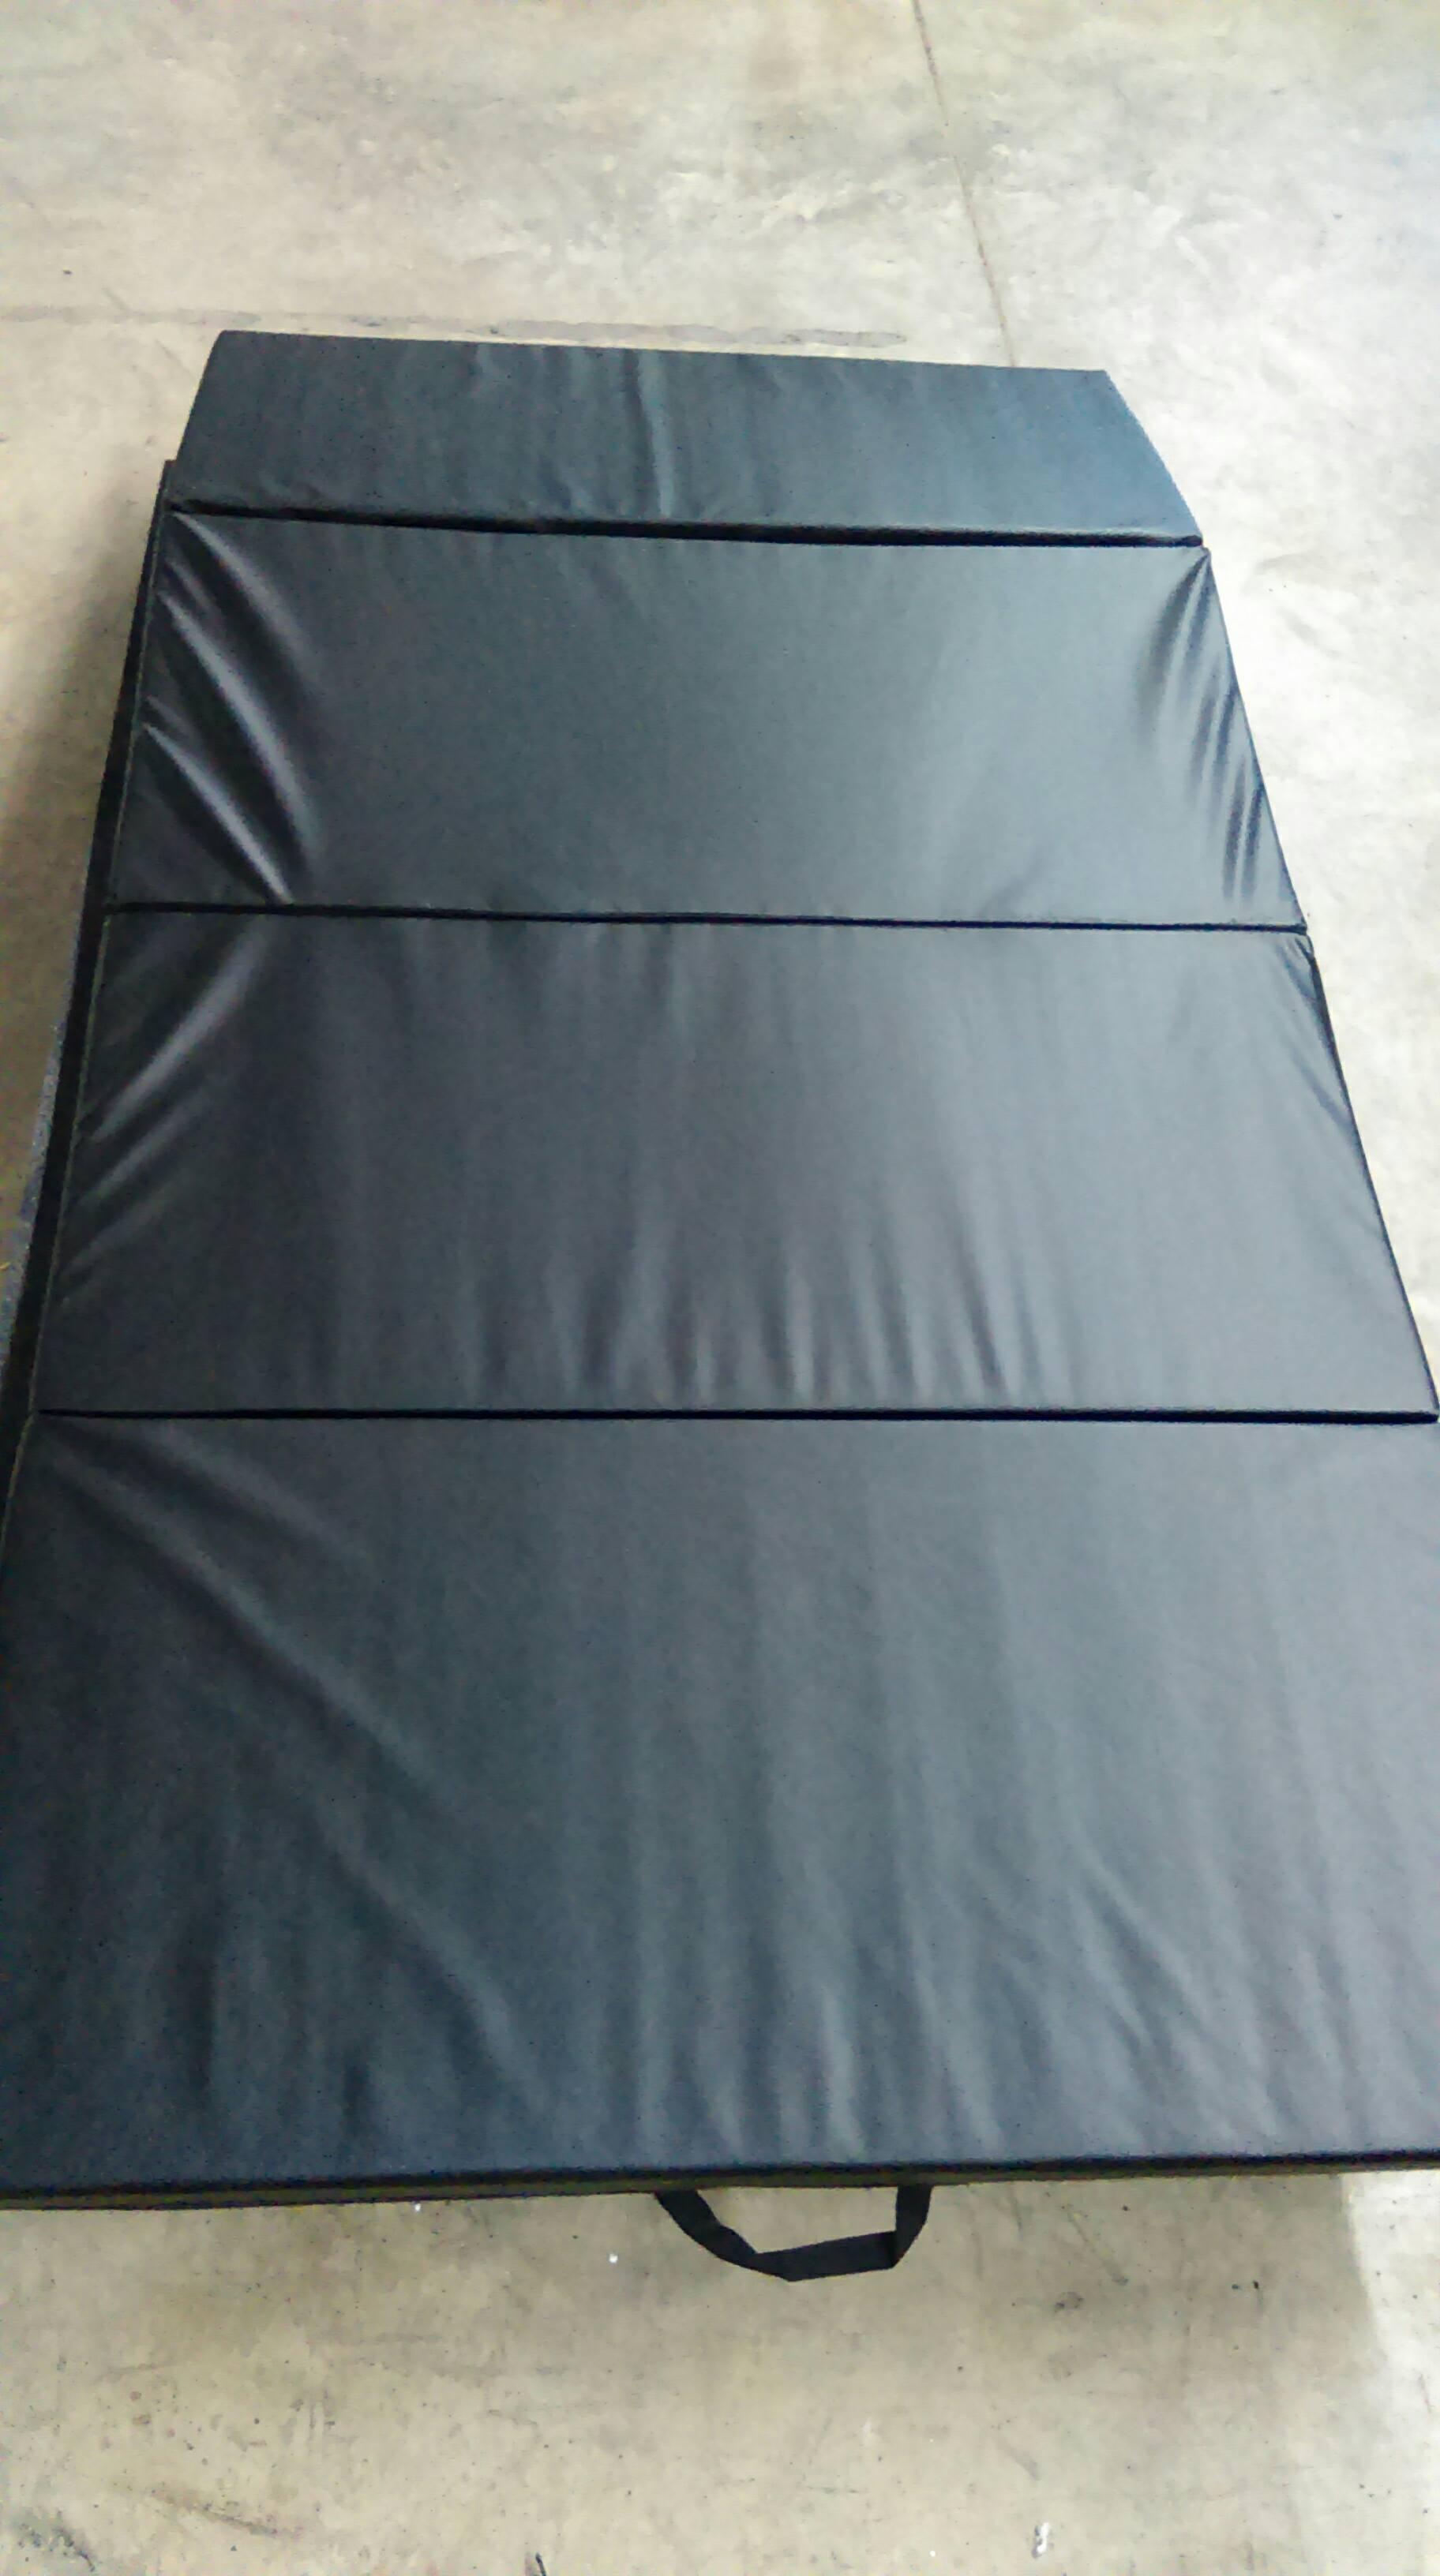 4x8x2 black panel tumbling mat. Black Bedroom Furniture Sets. Home Design Ideas